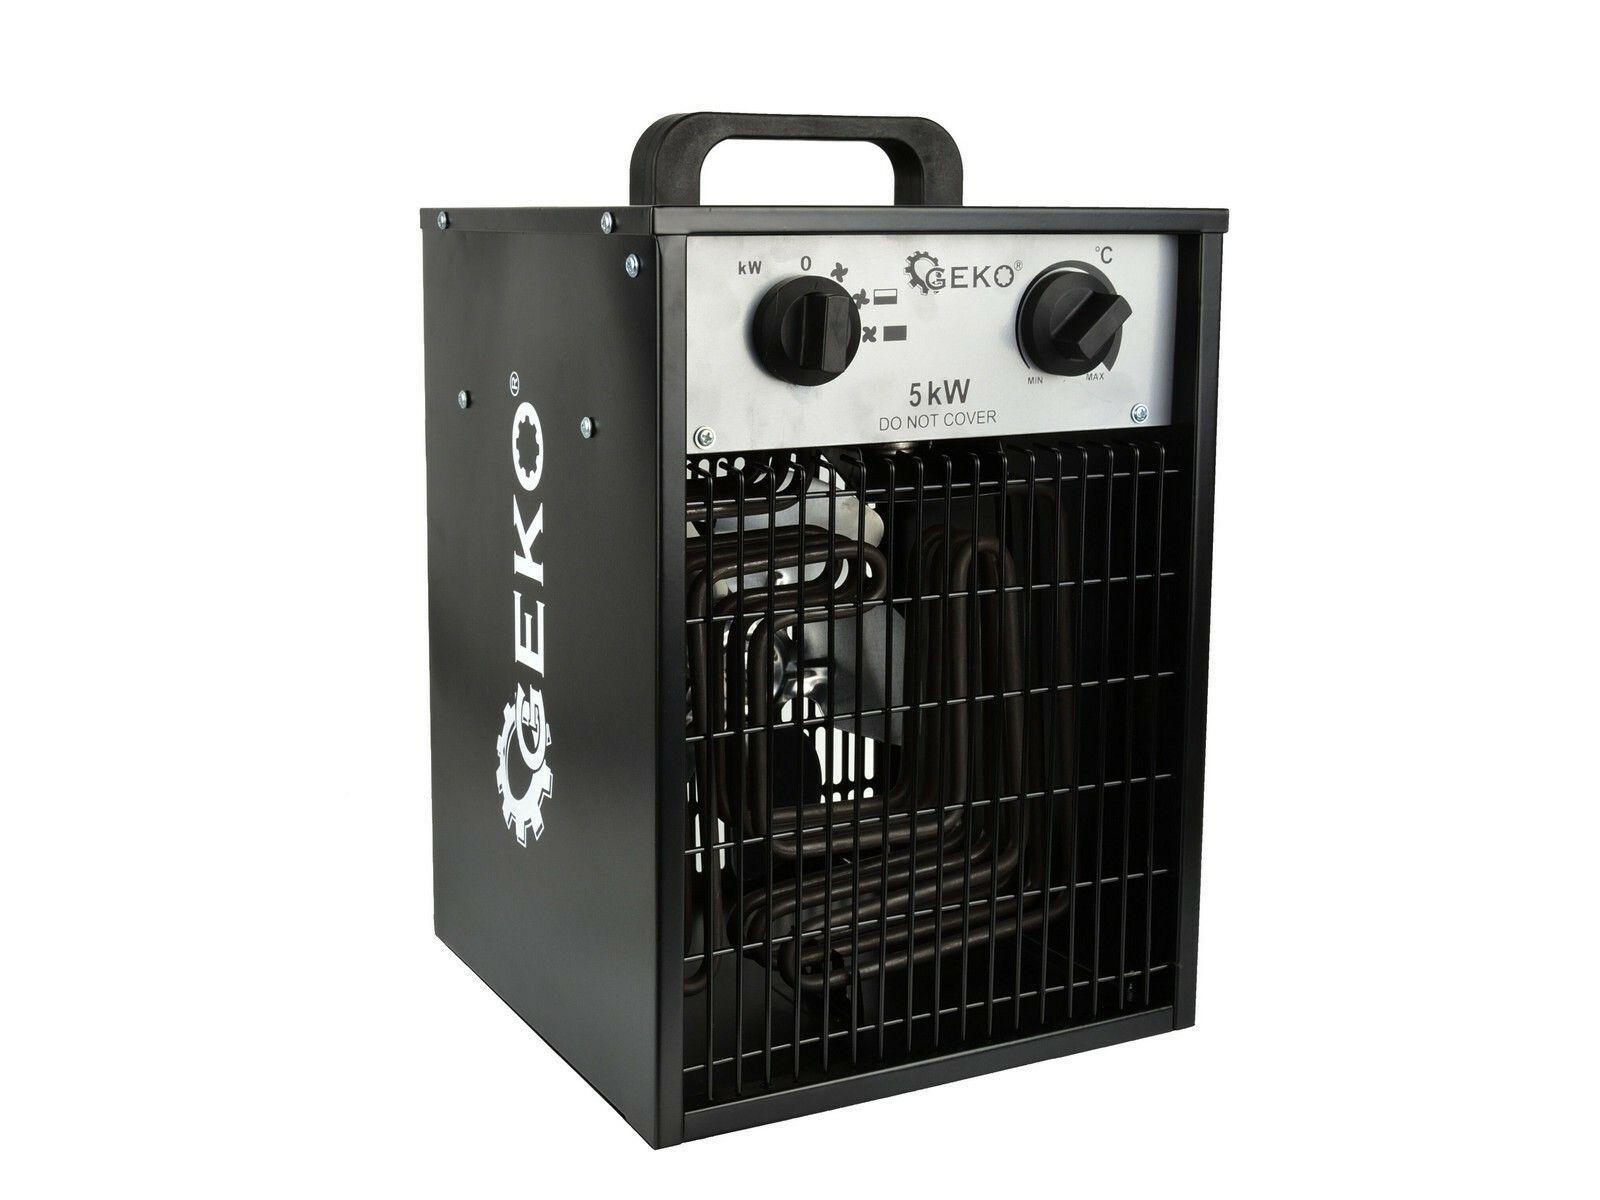 Elektrický ohřívač vzduchu s ventilátorem 5kW